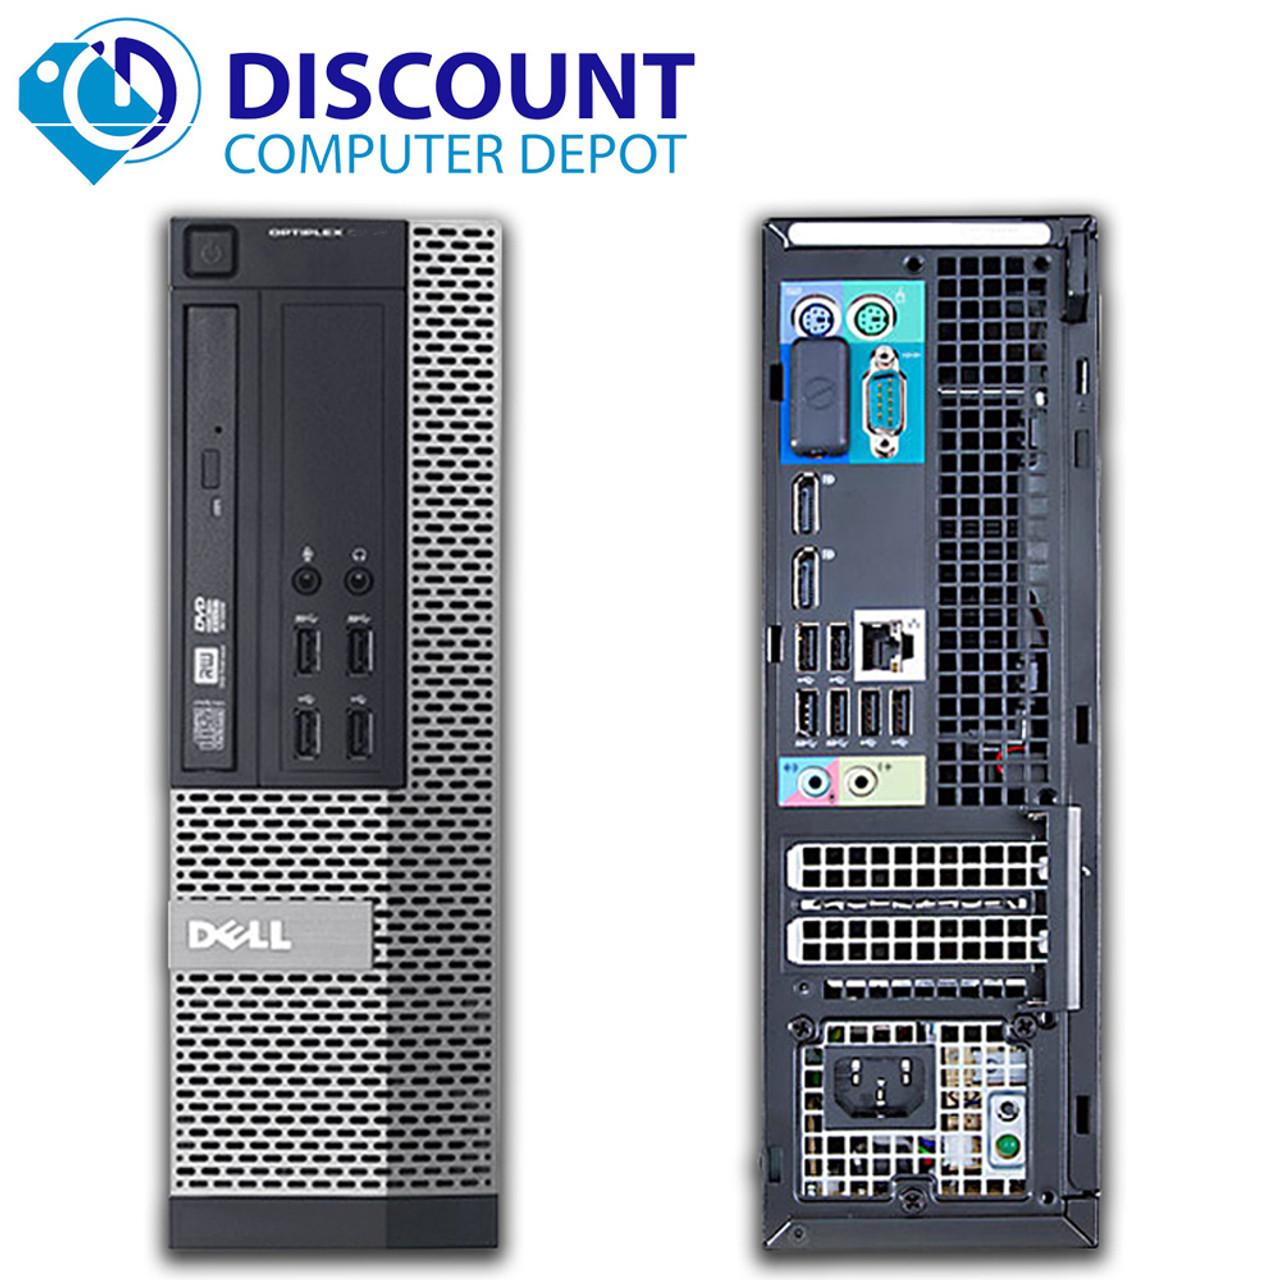 Dell Optiplex 990 Windows 10 Pro Desktop Computer SFF Quad i5 3 1GHz 16GB  1TB and WIFI